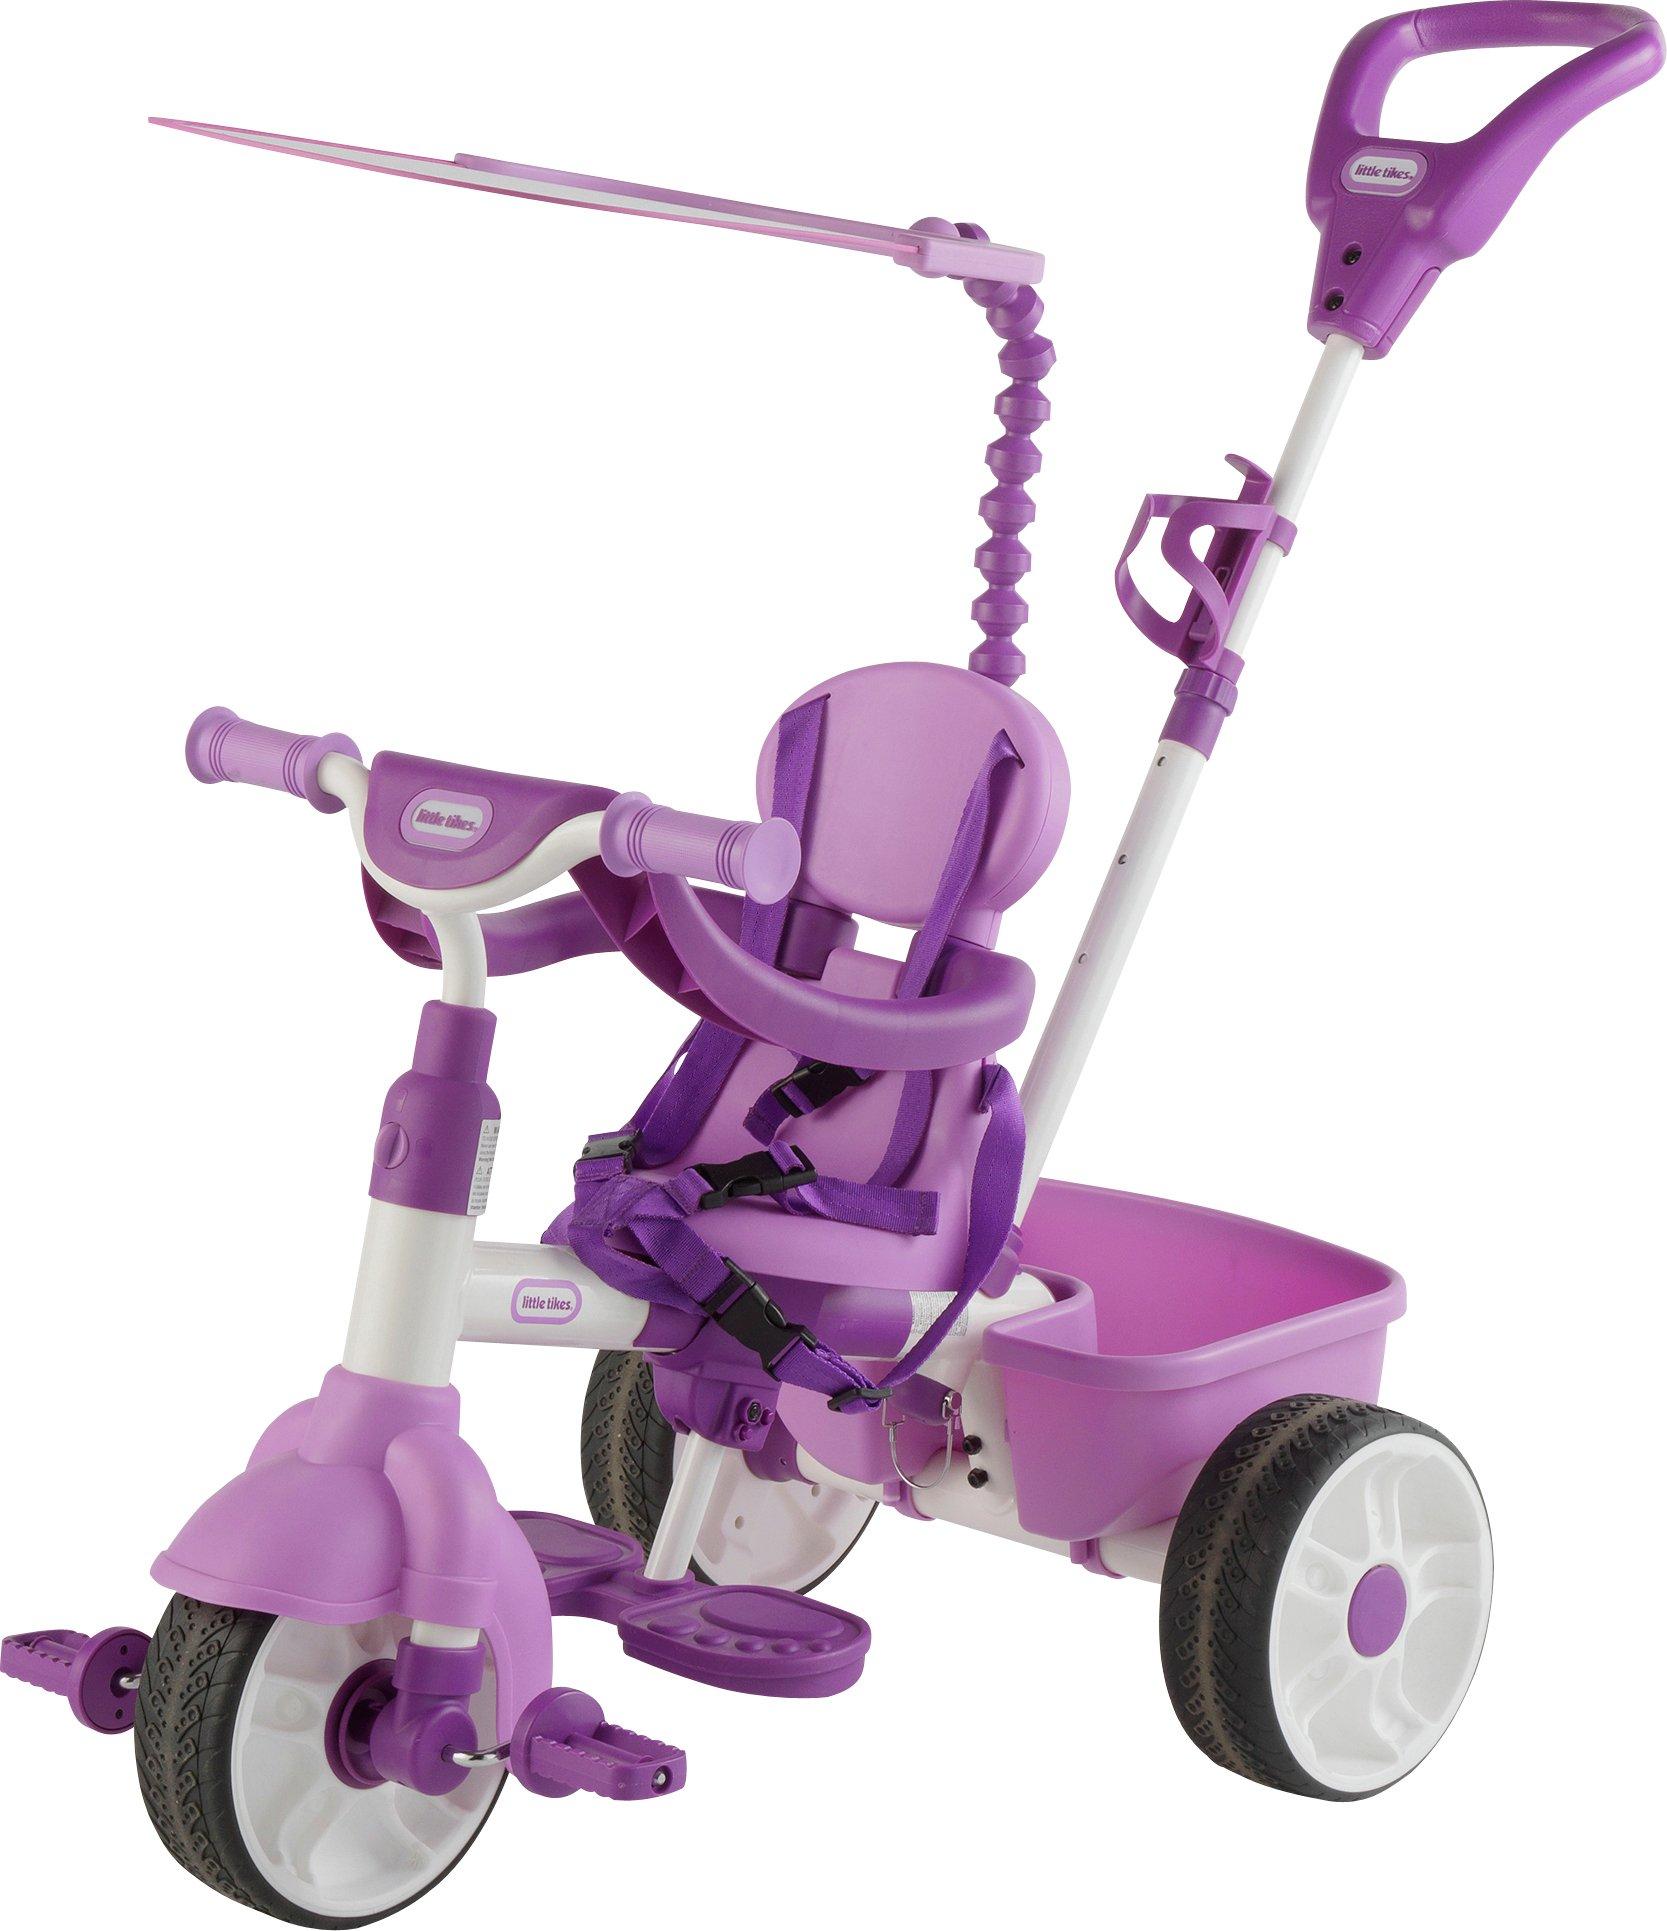 Little Tikes - 4-in-1 Trike - Pink